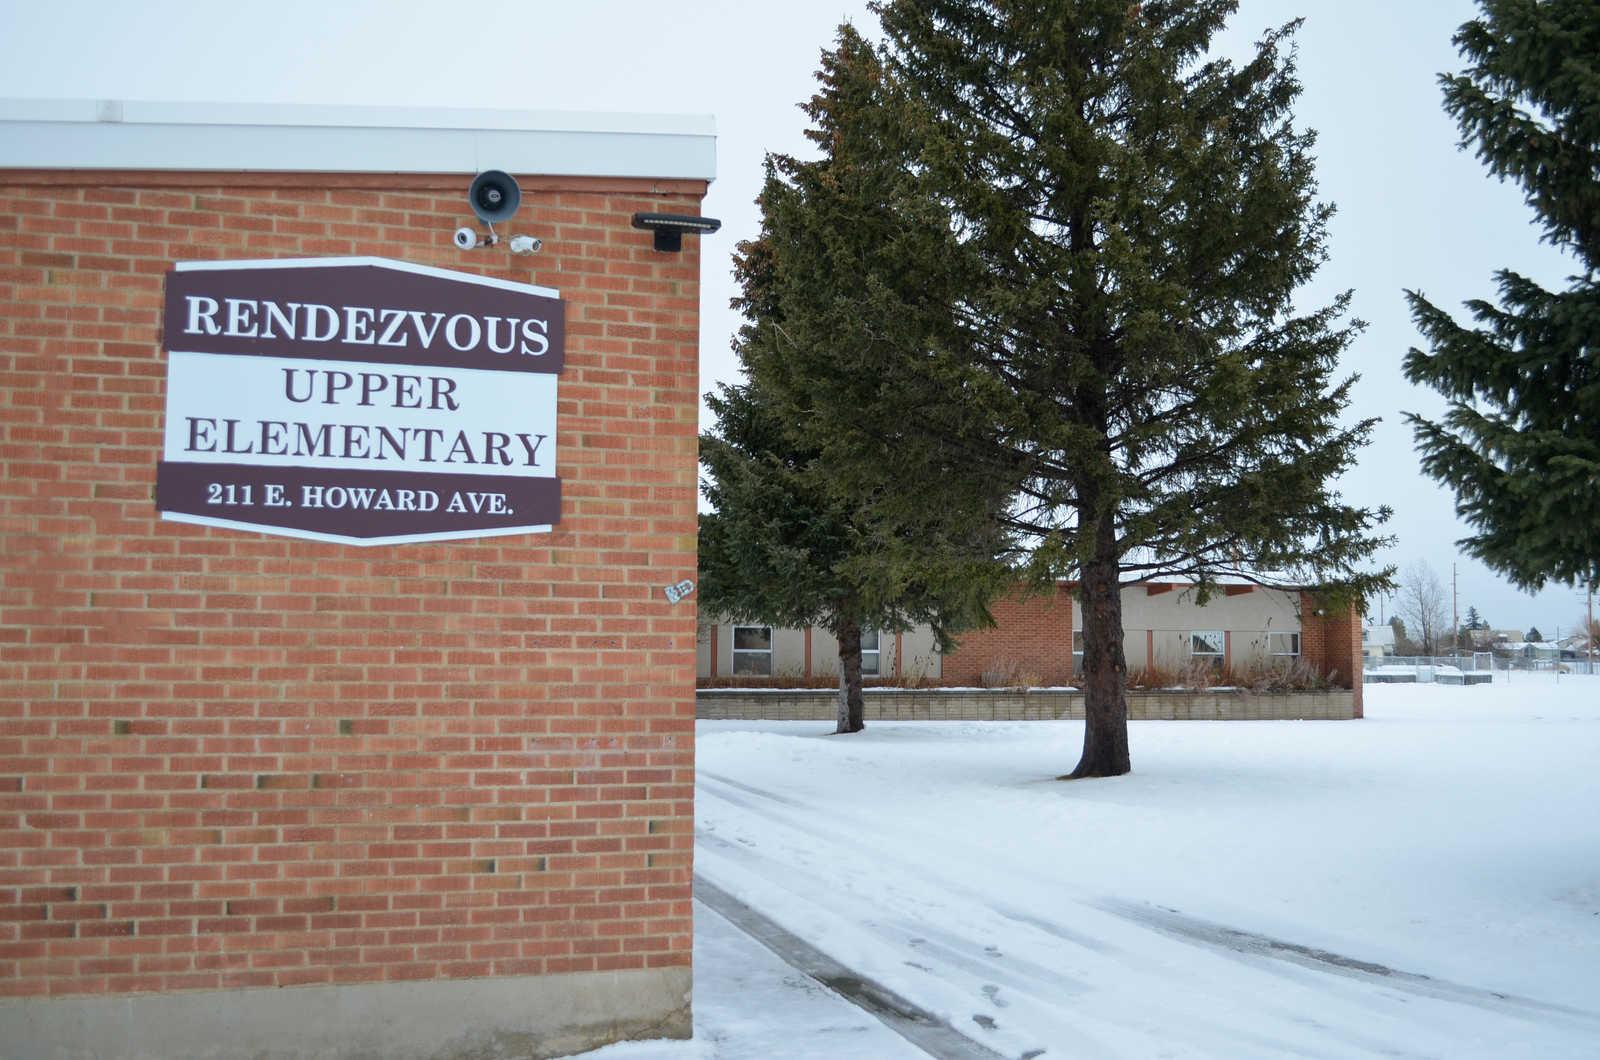 Rendezvous Upper Elementary